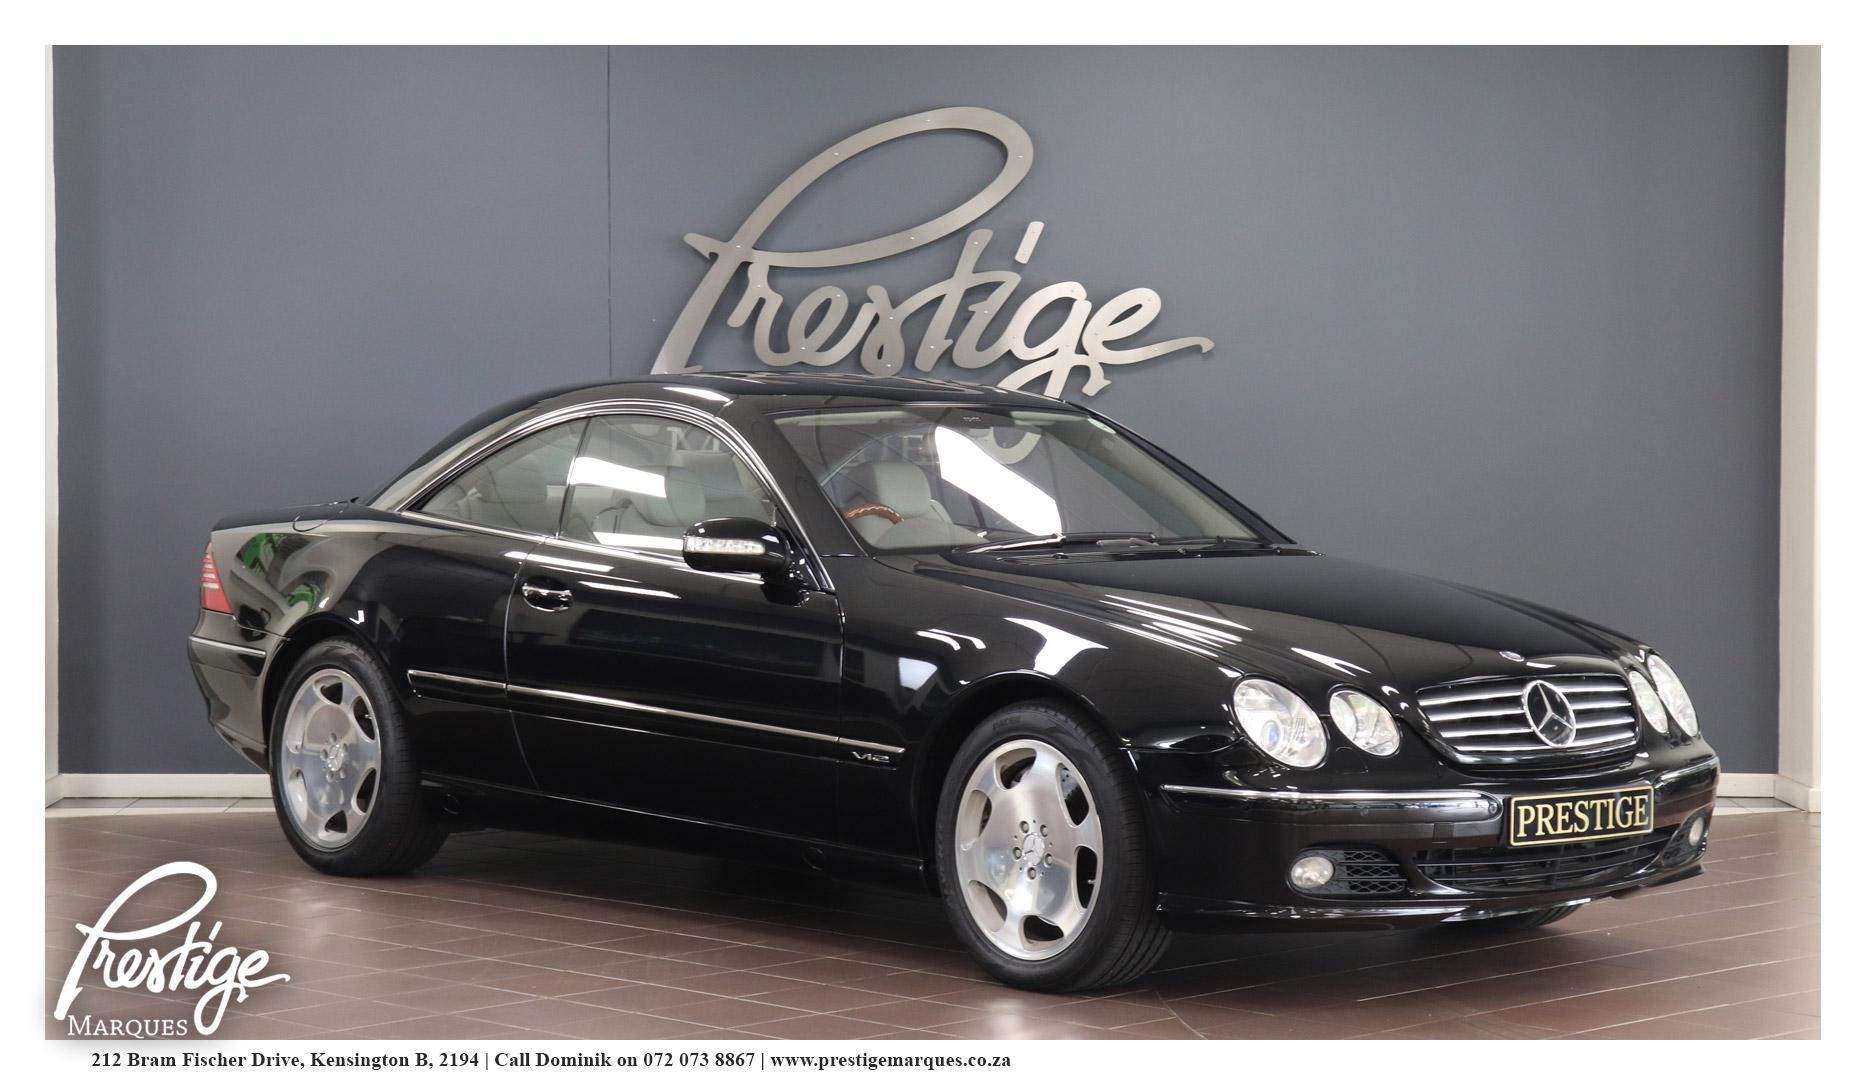 2005-Mercedes-Benz-CL-600-Coupe-Prestige-Marques-Randburg-Sandton-1